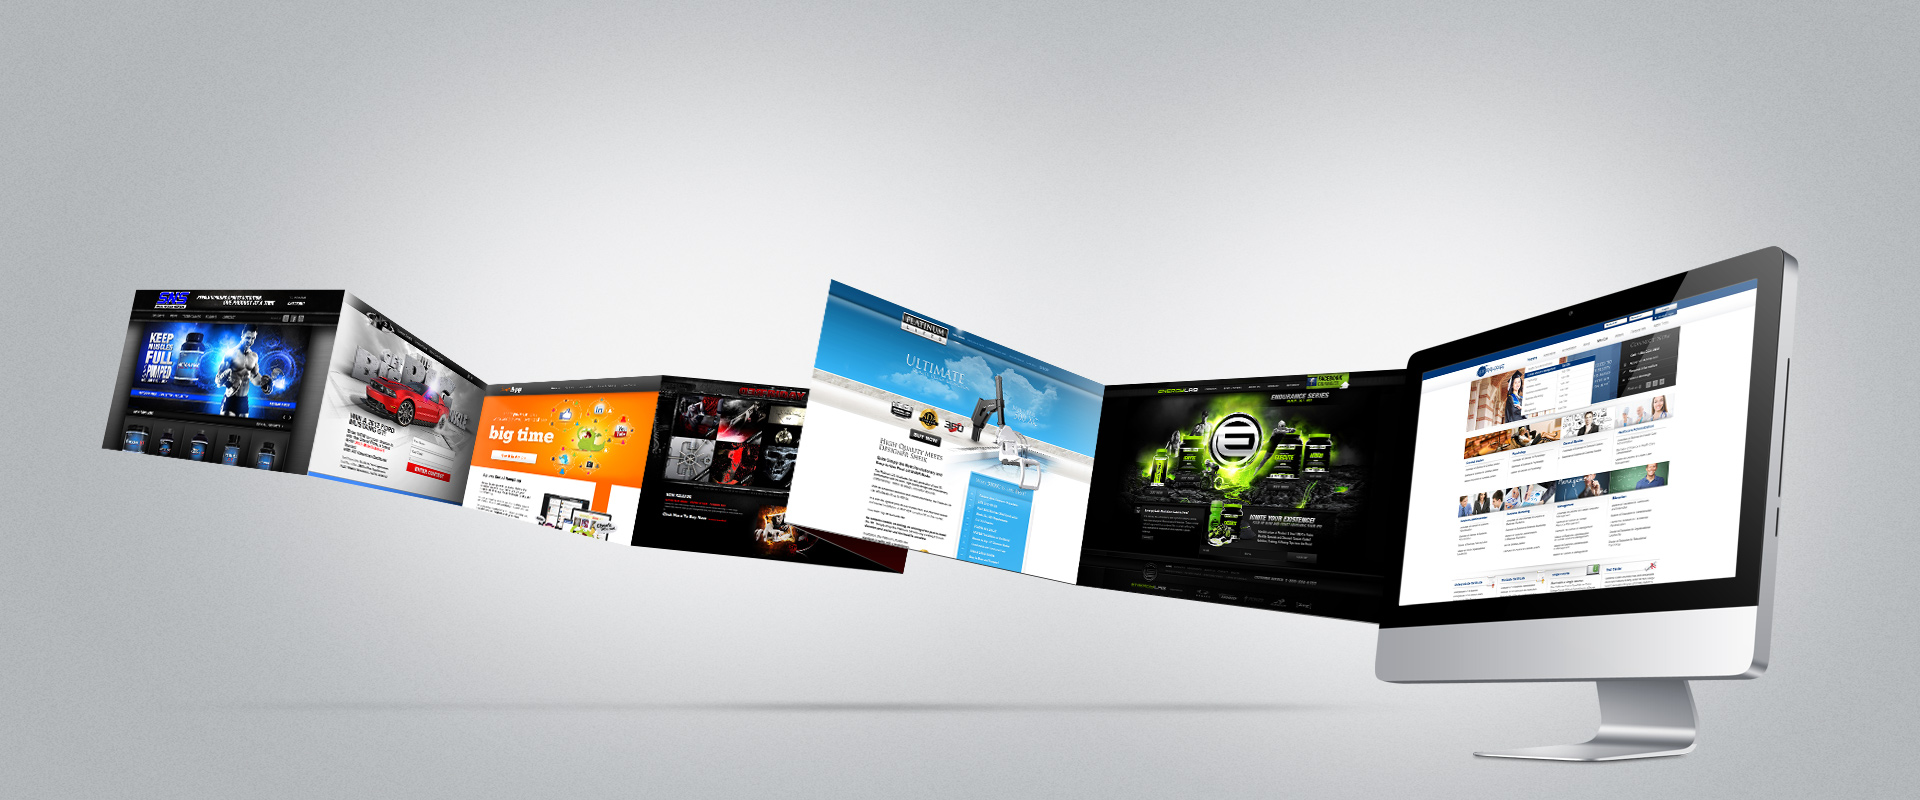 blu-system-web-design-pavia